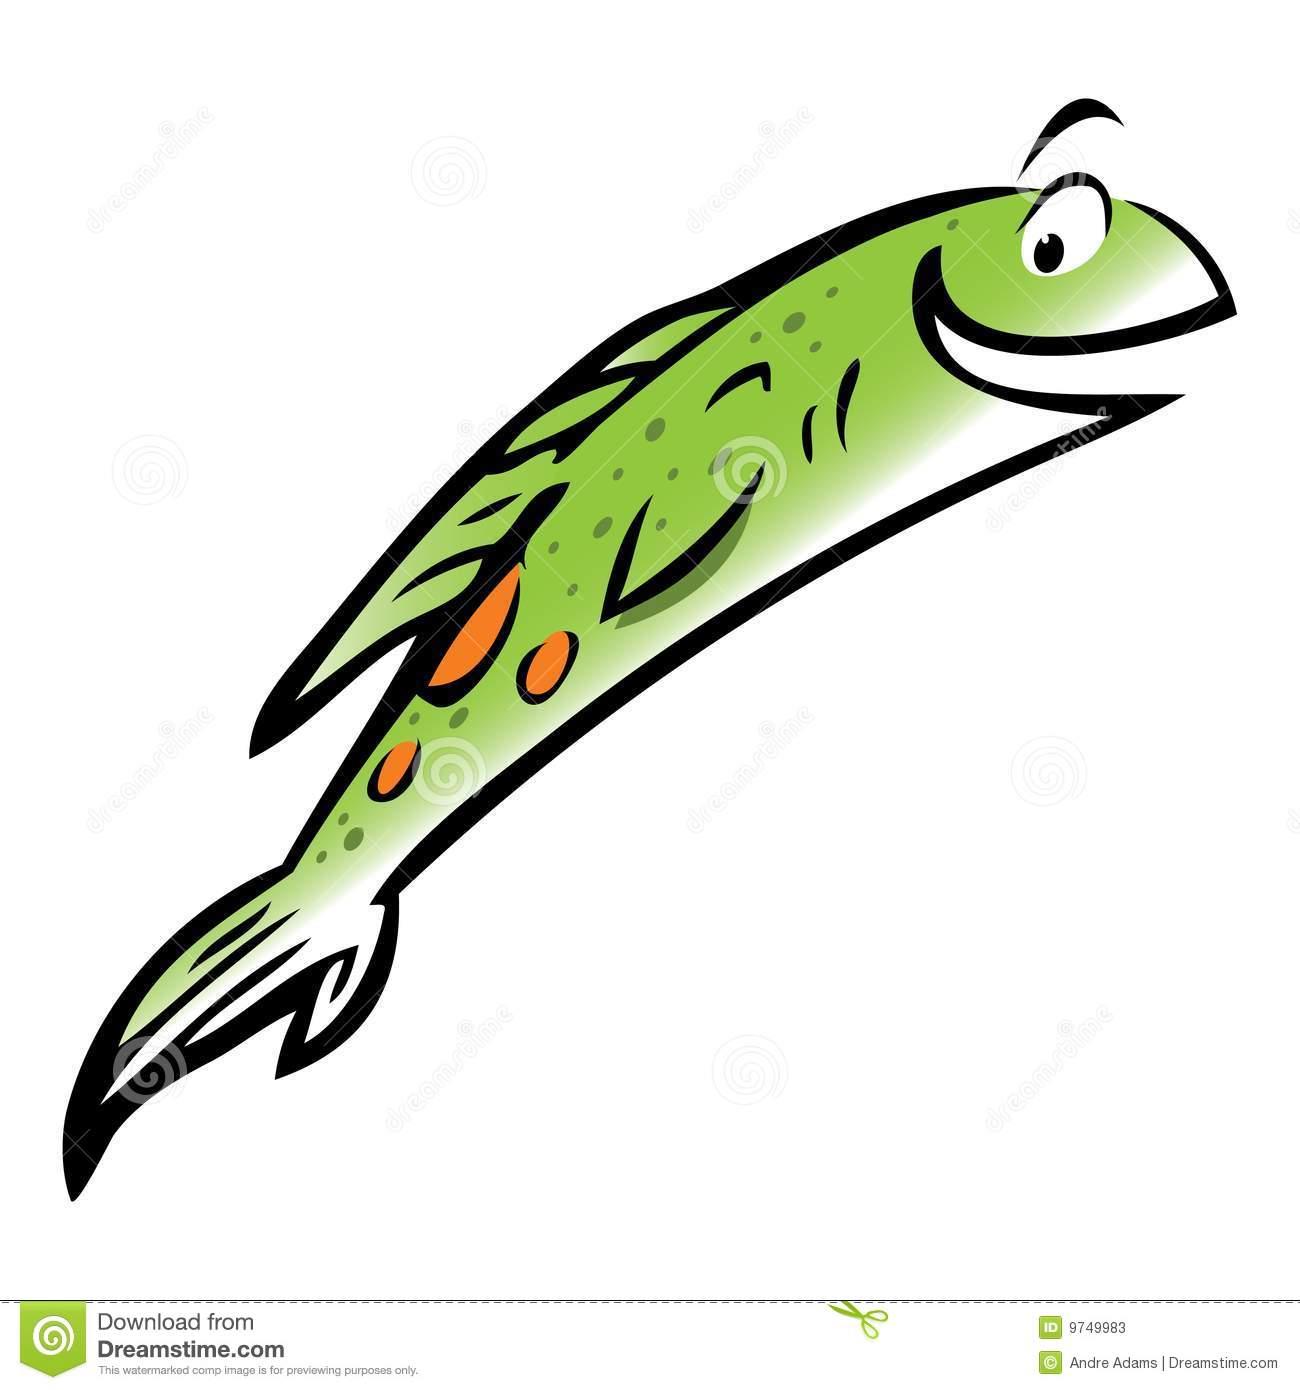 Salmon clipart. Fish clip art panda